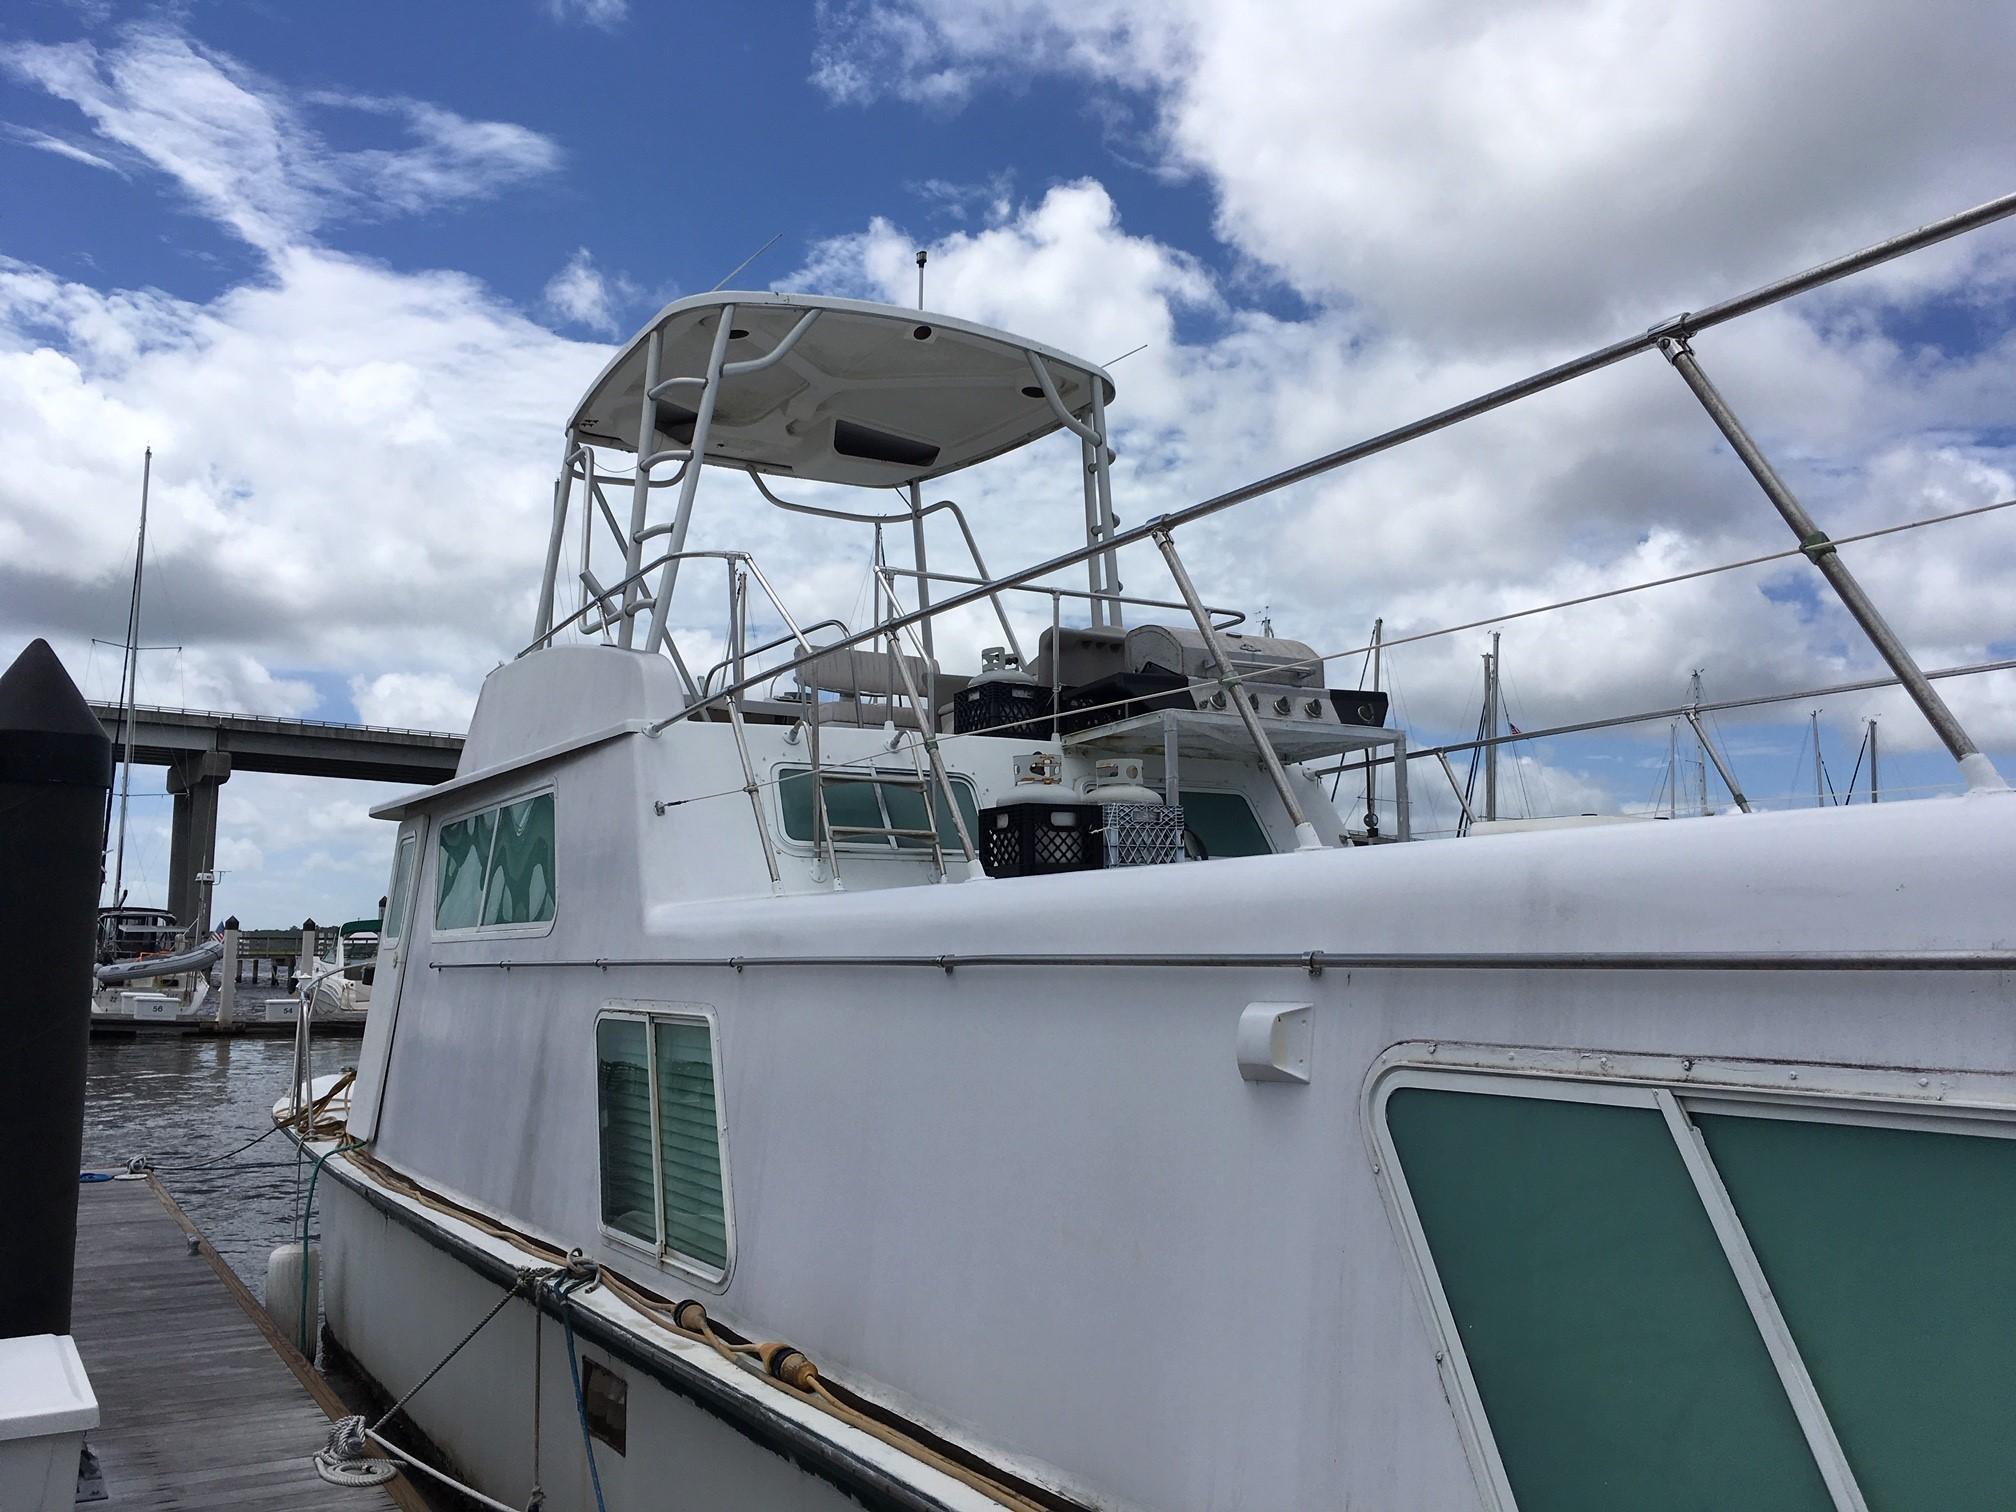 Carri-craft 57-ft Power Catamaran - carri-craft port